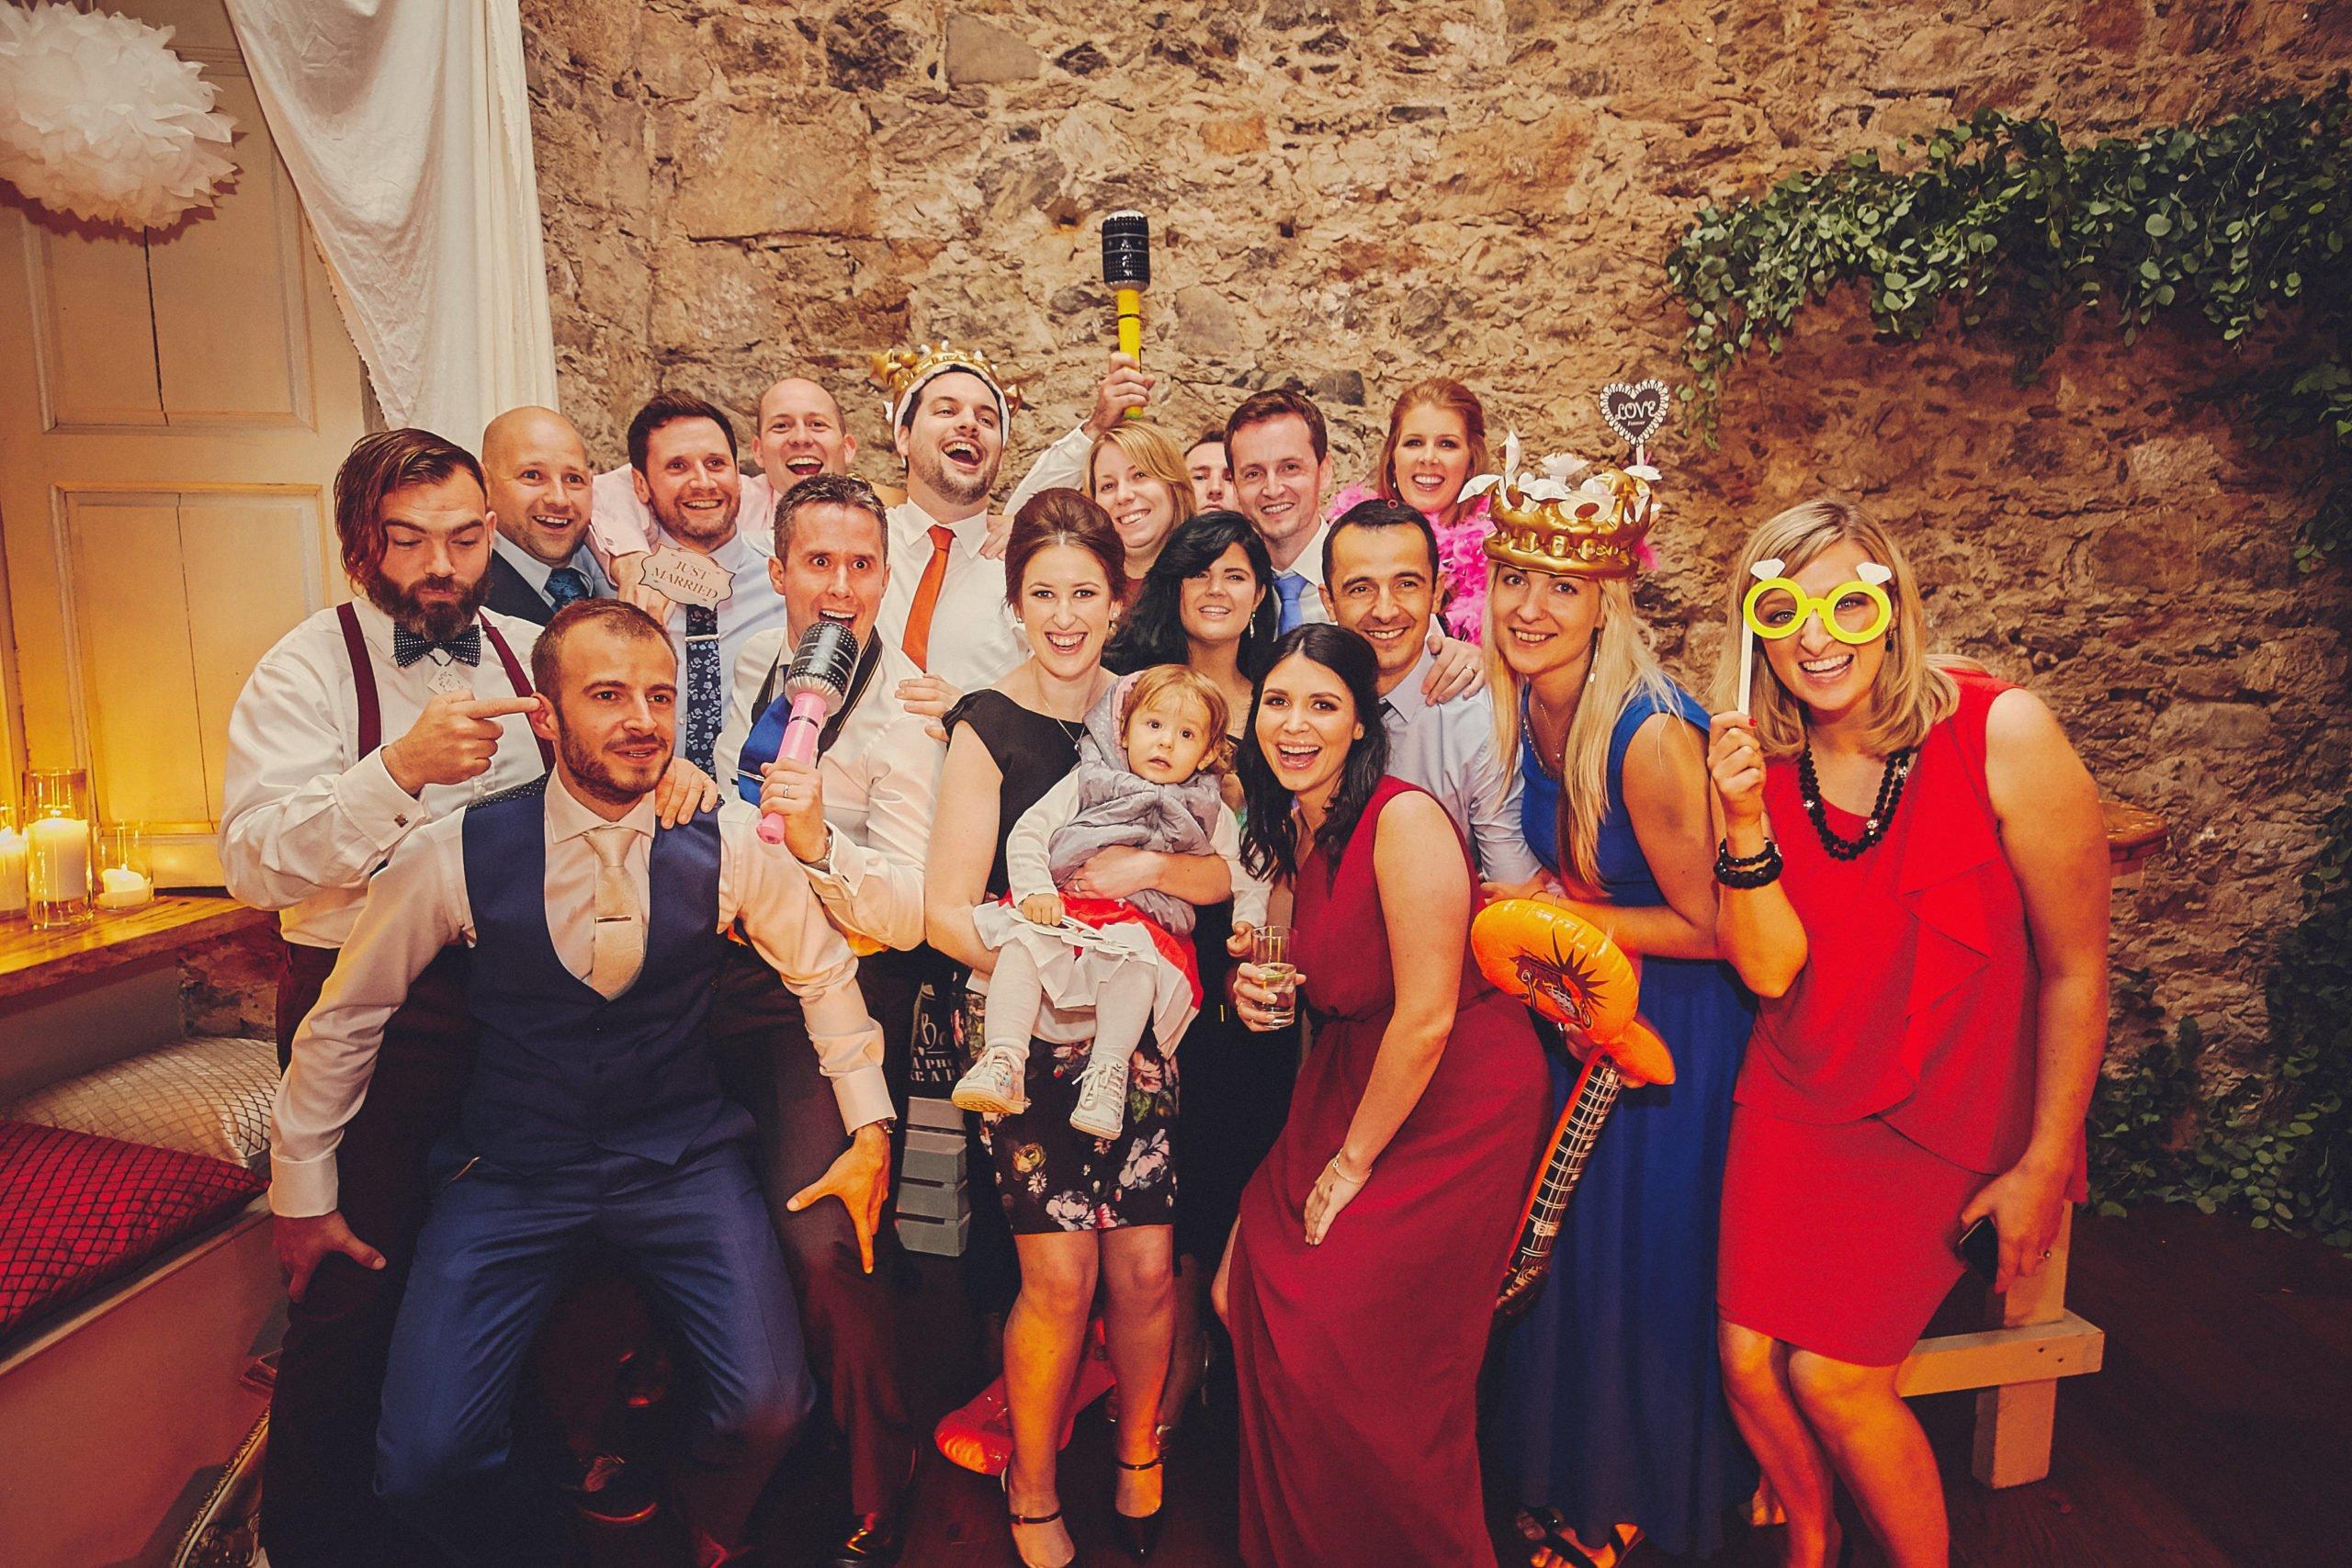 Cloughjordan House Wedding - Alternative Venue 143